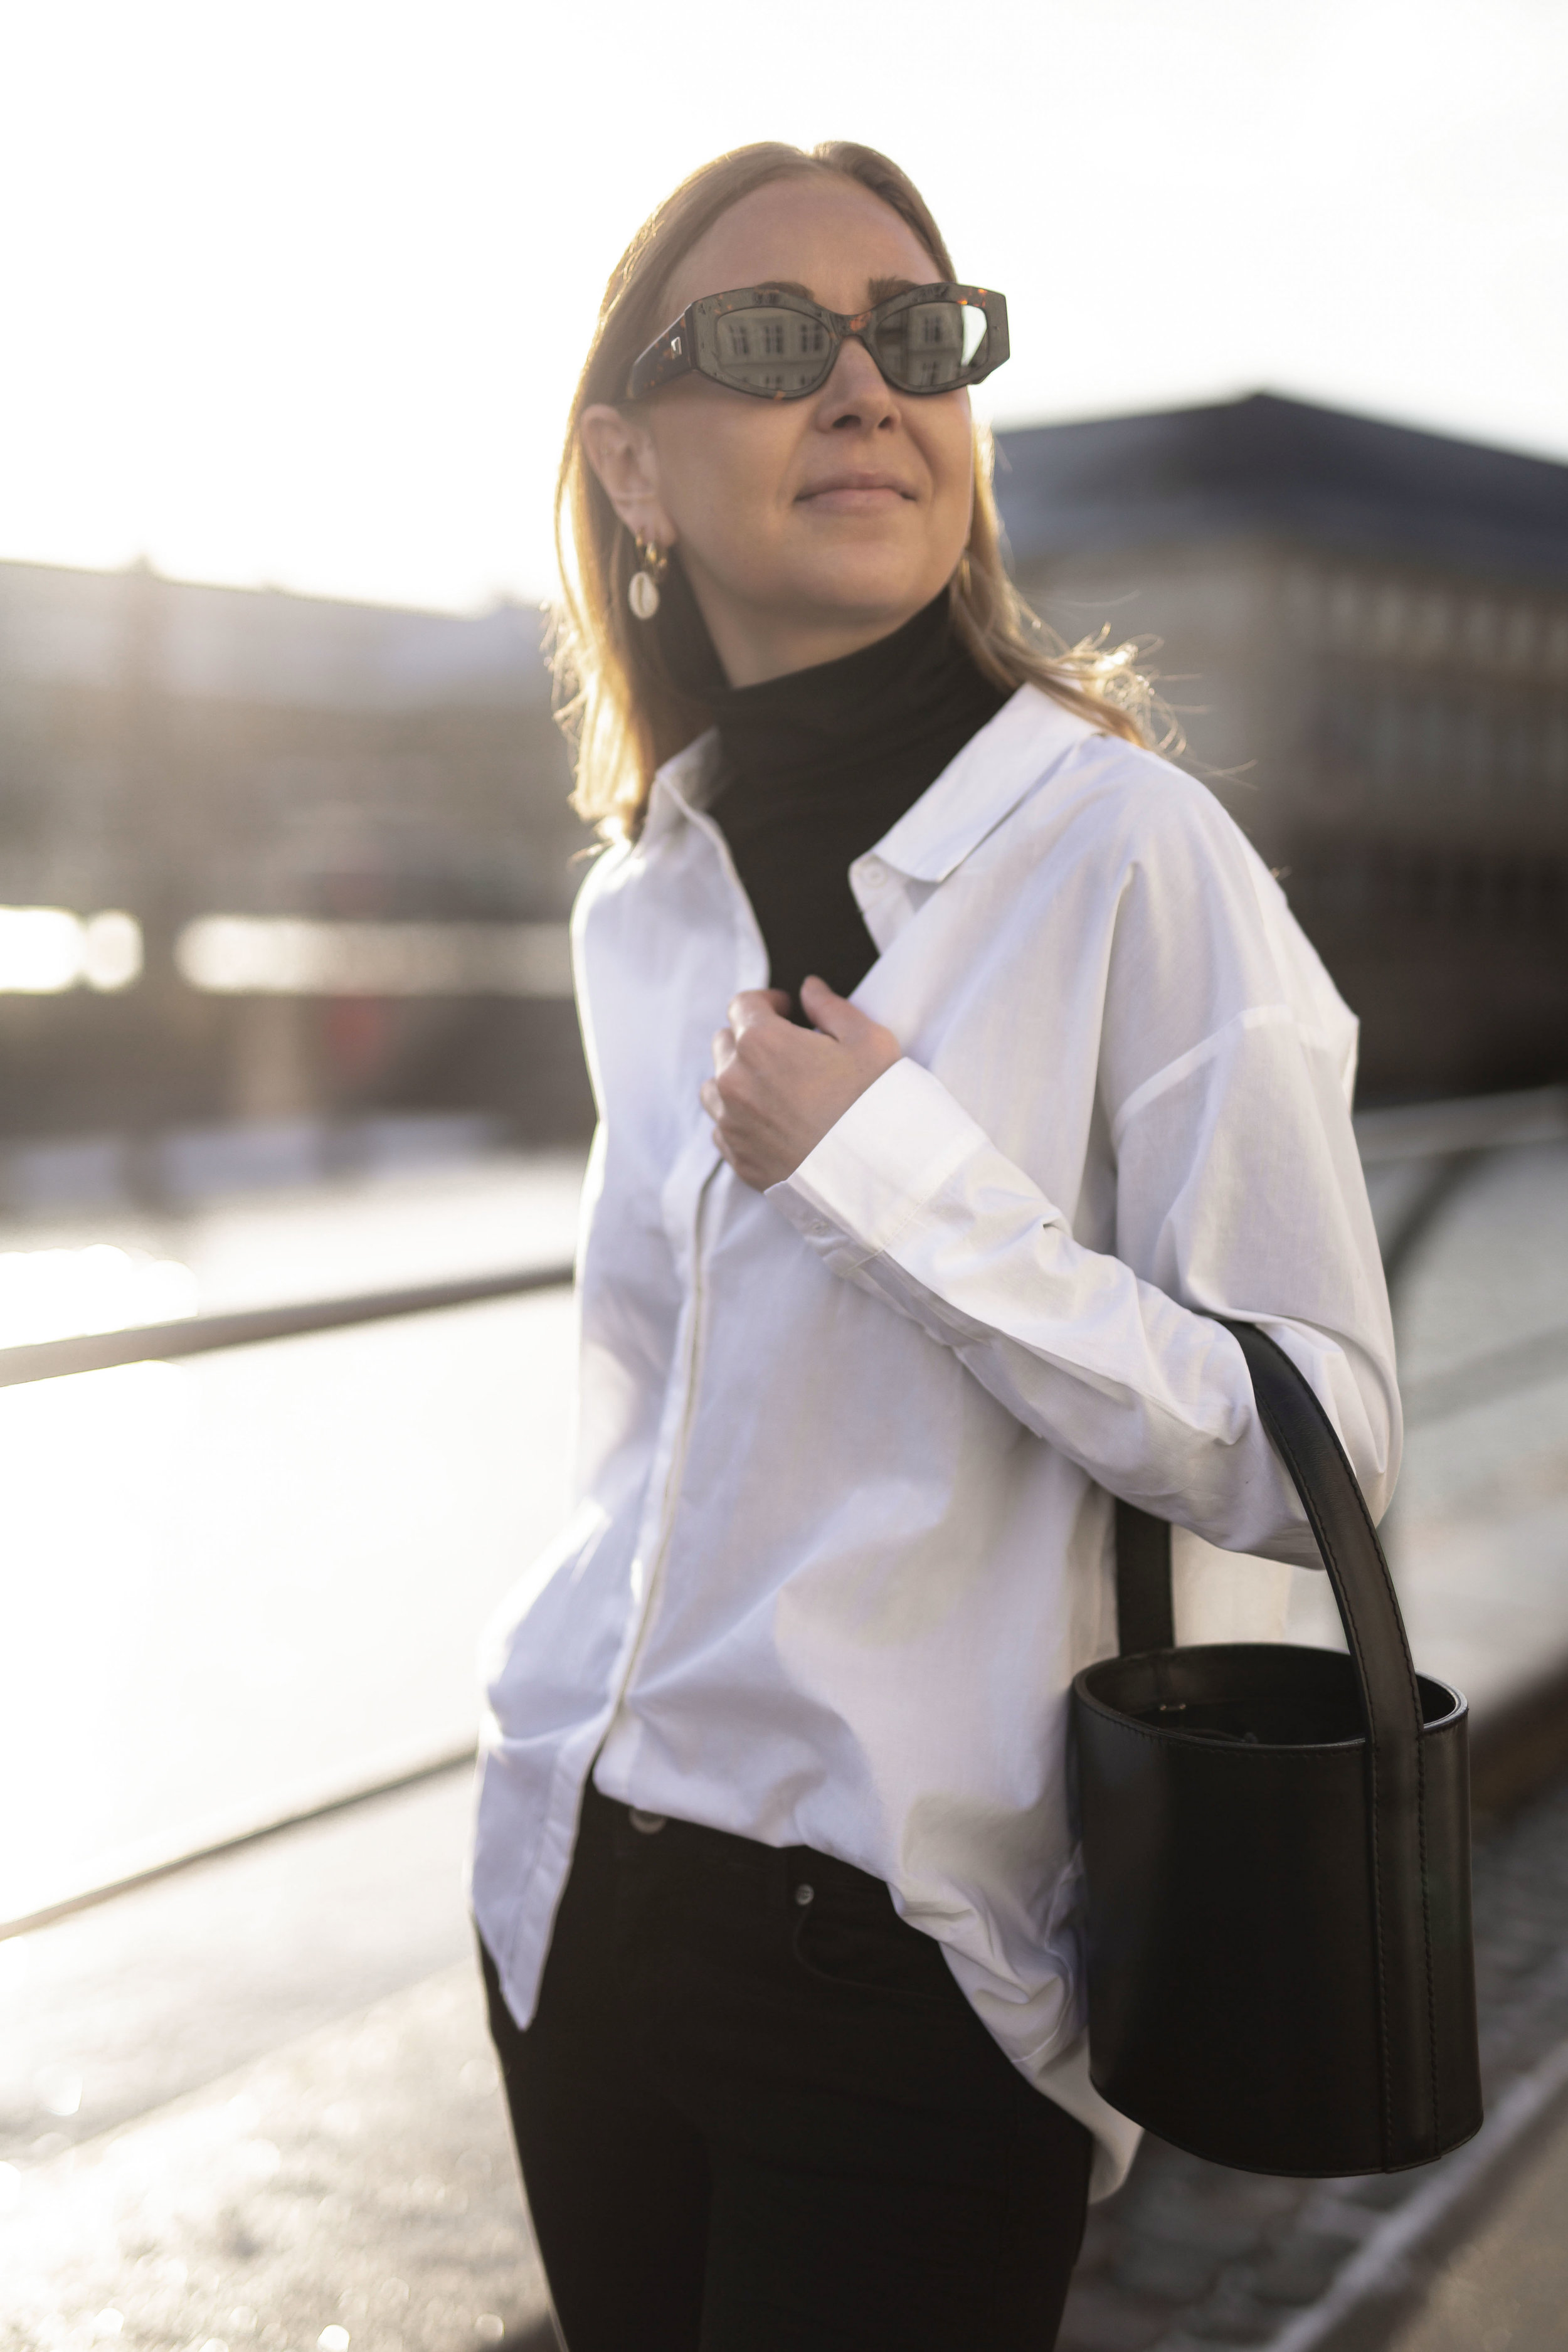 Katrine Krog on the streets of Copenhagen wearing Denim Hunter shirt and black denim pants